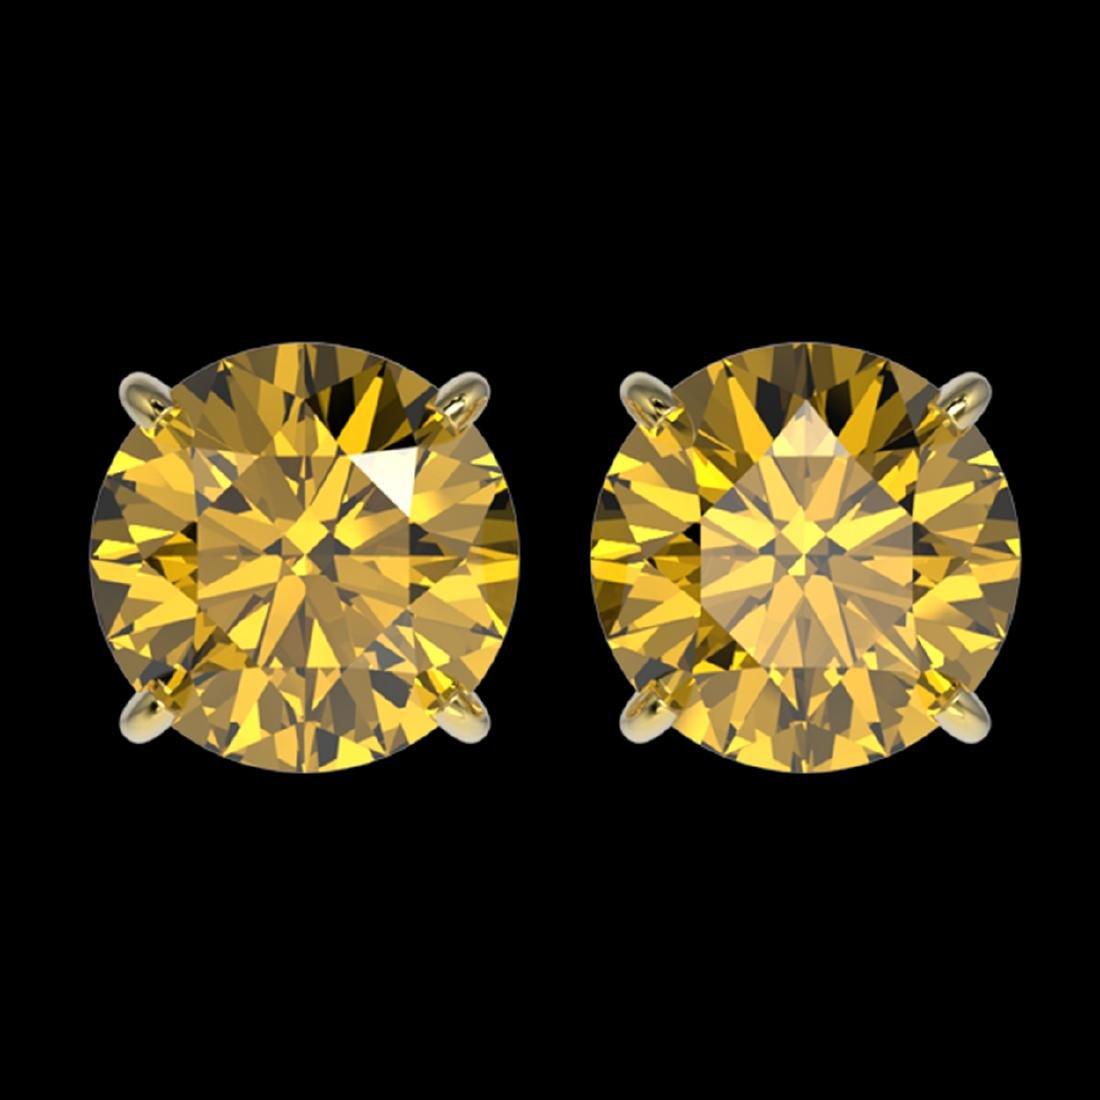 3 ctw Intense Yellow Diamond Stud Earrings 10K Yellow